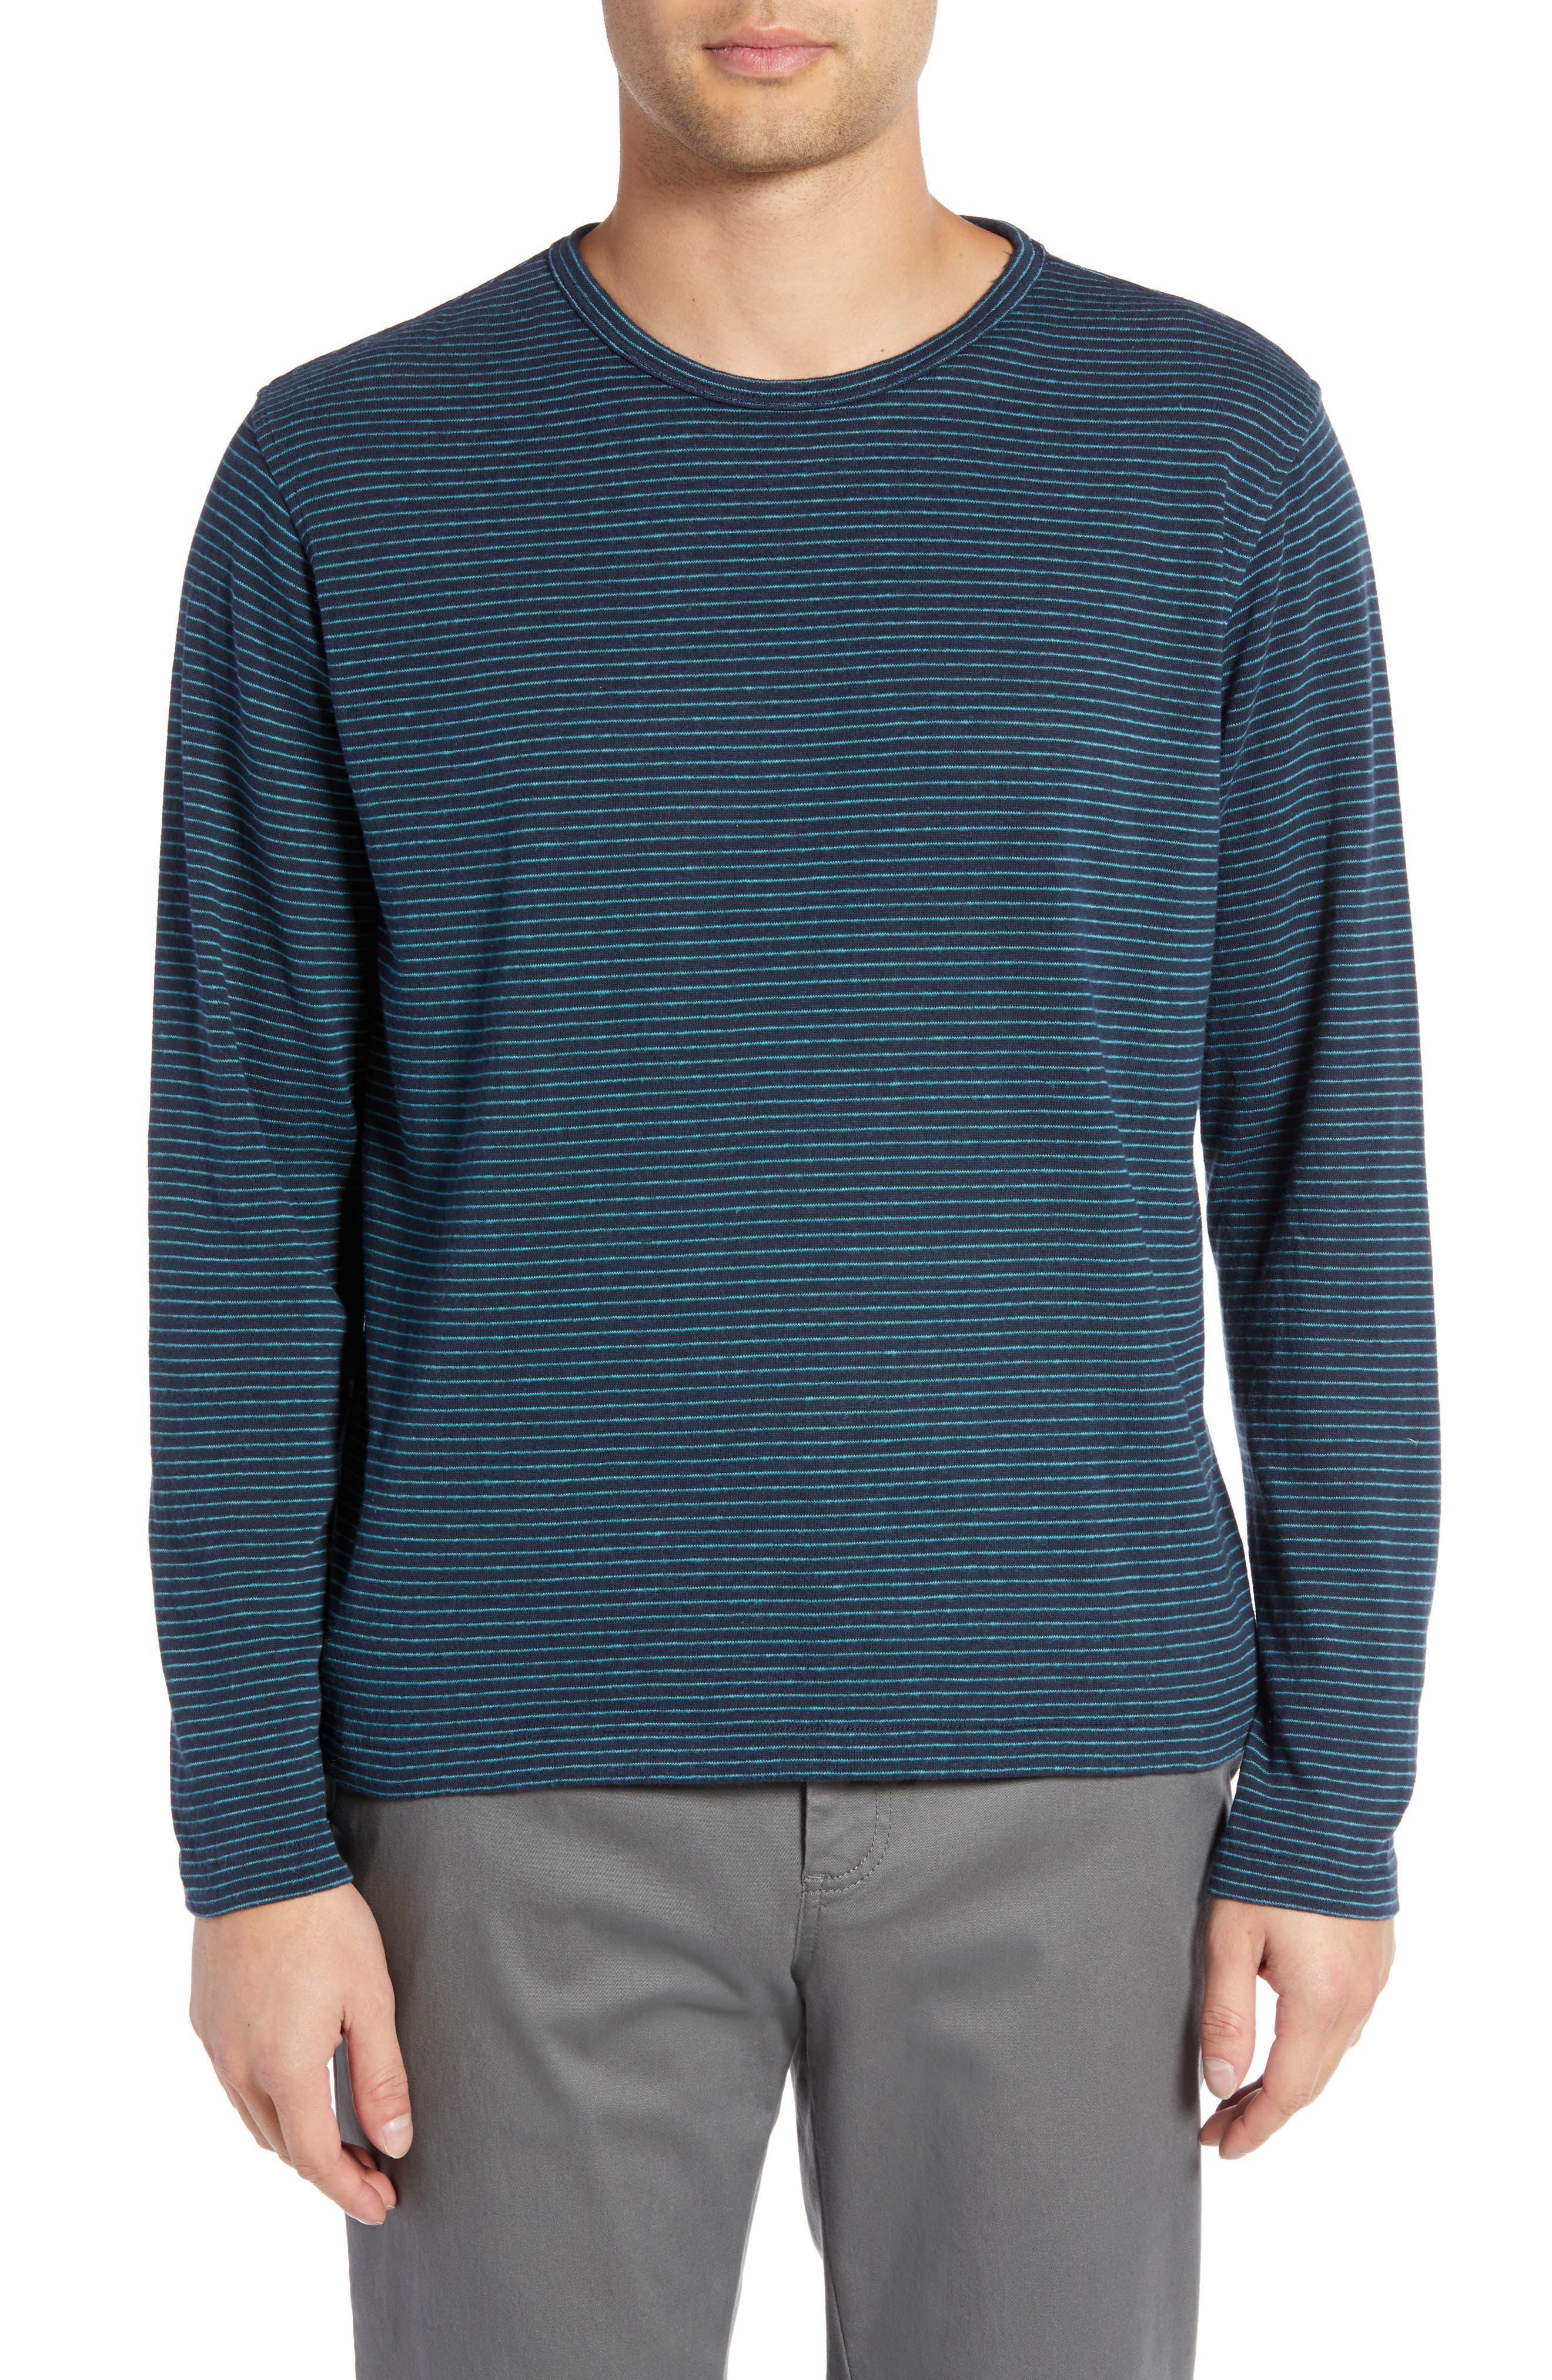 Narrow Stripe Long Sleeve T-Shirt,                             Main thumbnail 1, color,                             NAVY/ BLUE